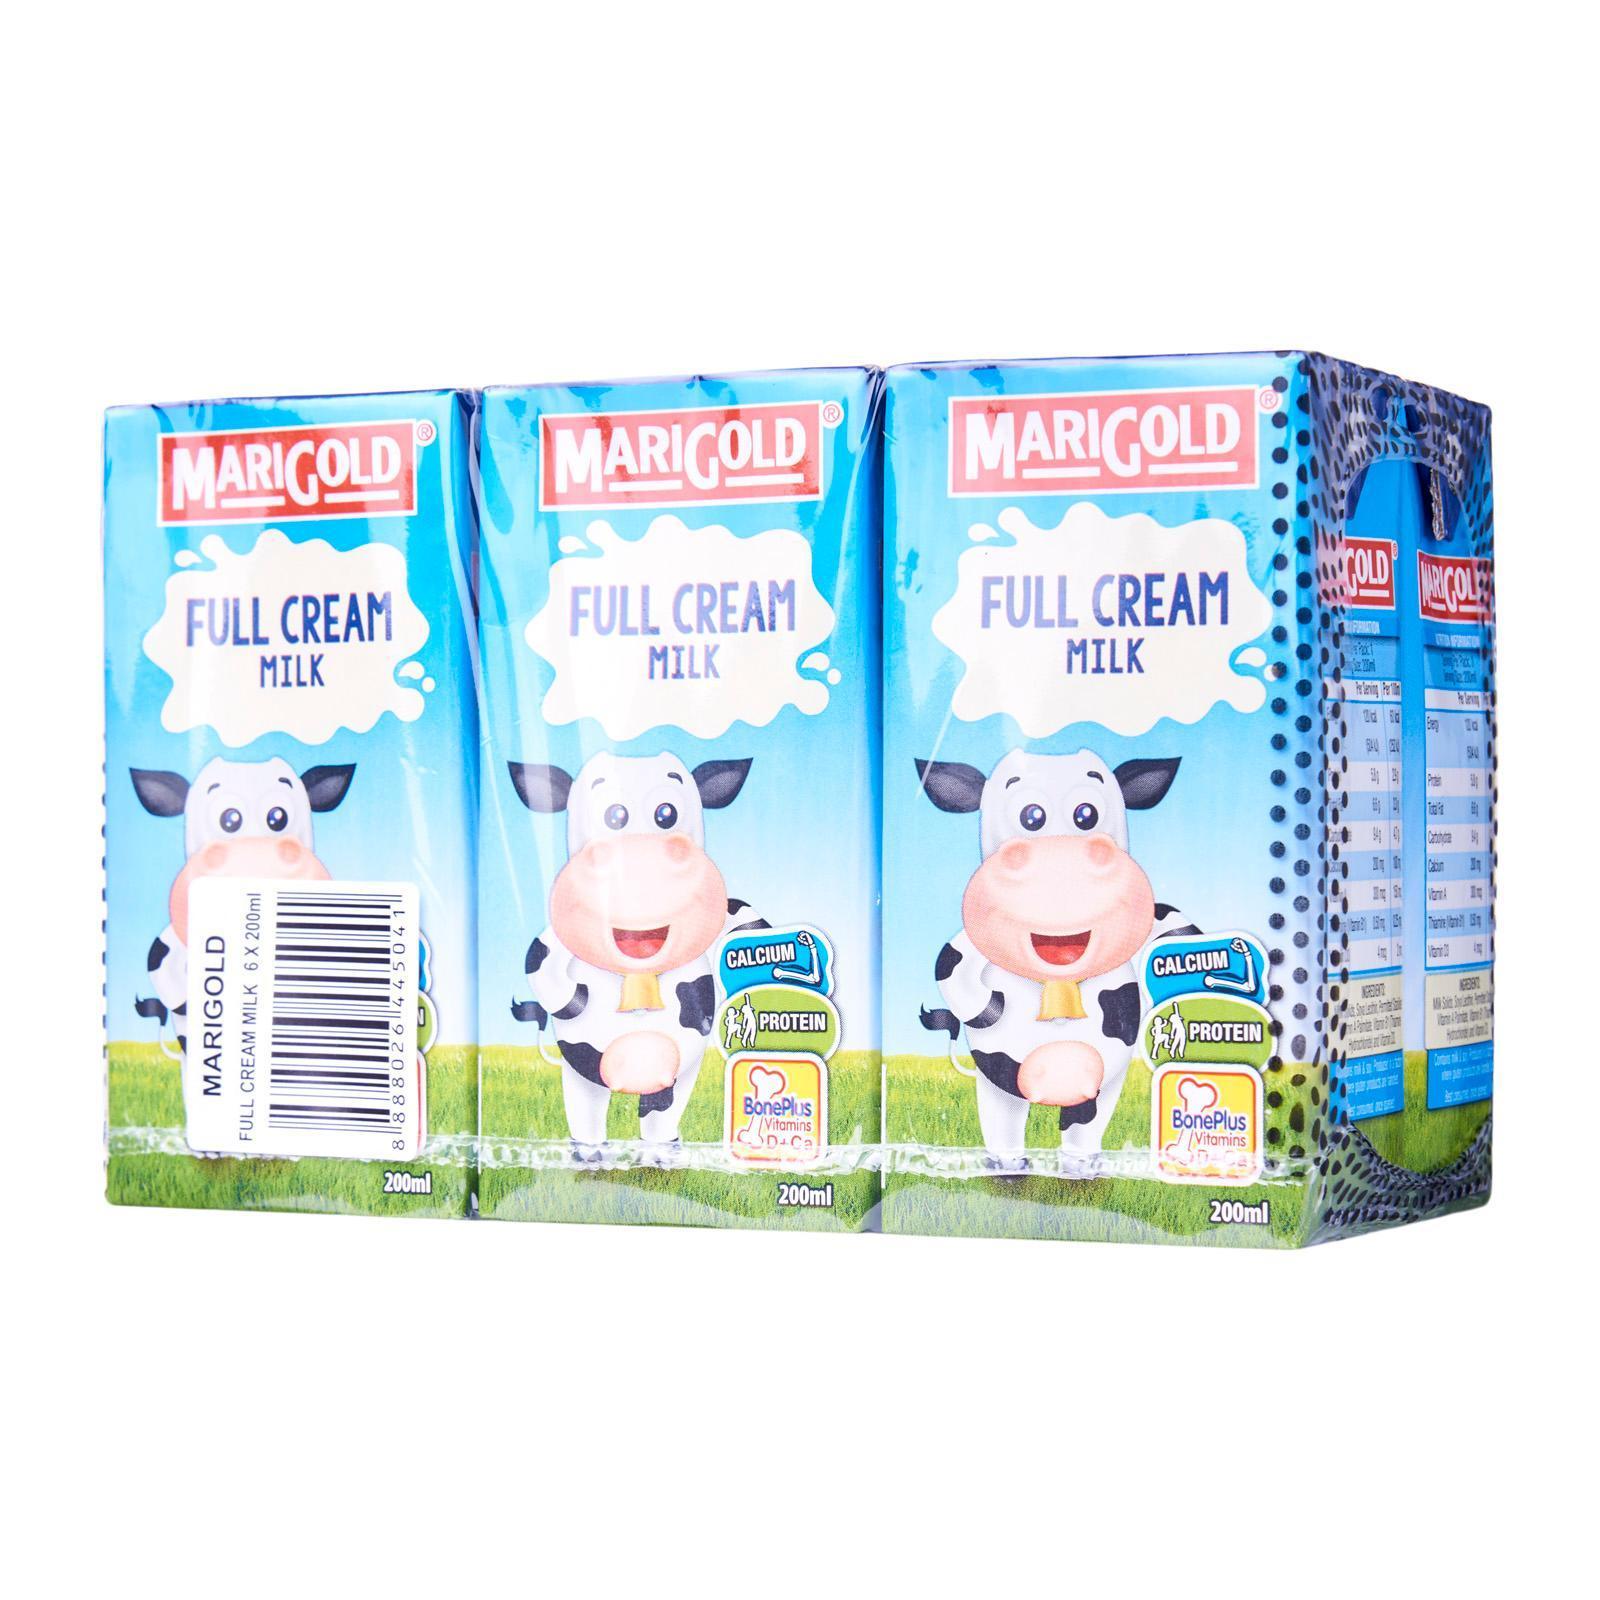 MARIGOLD UHT Full Cream Milk 6sX200ml